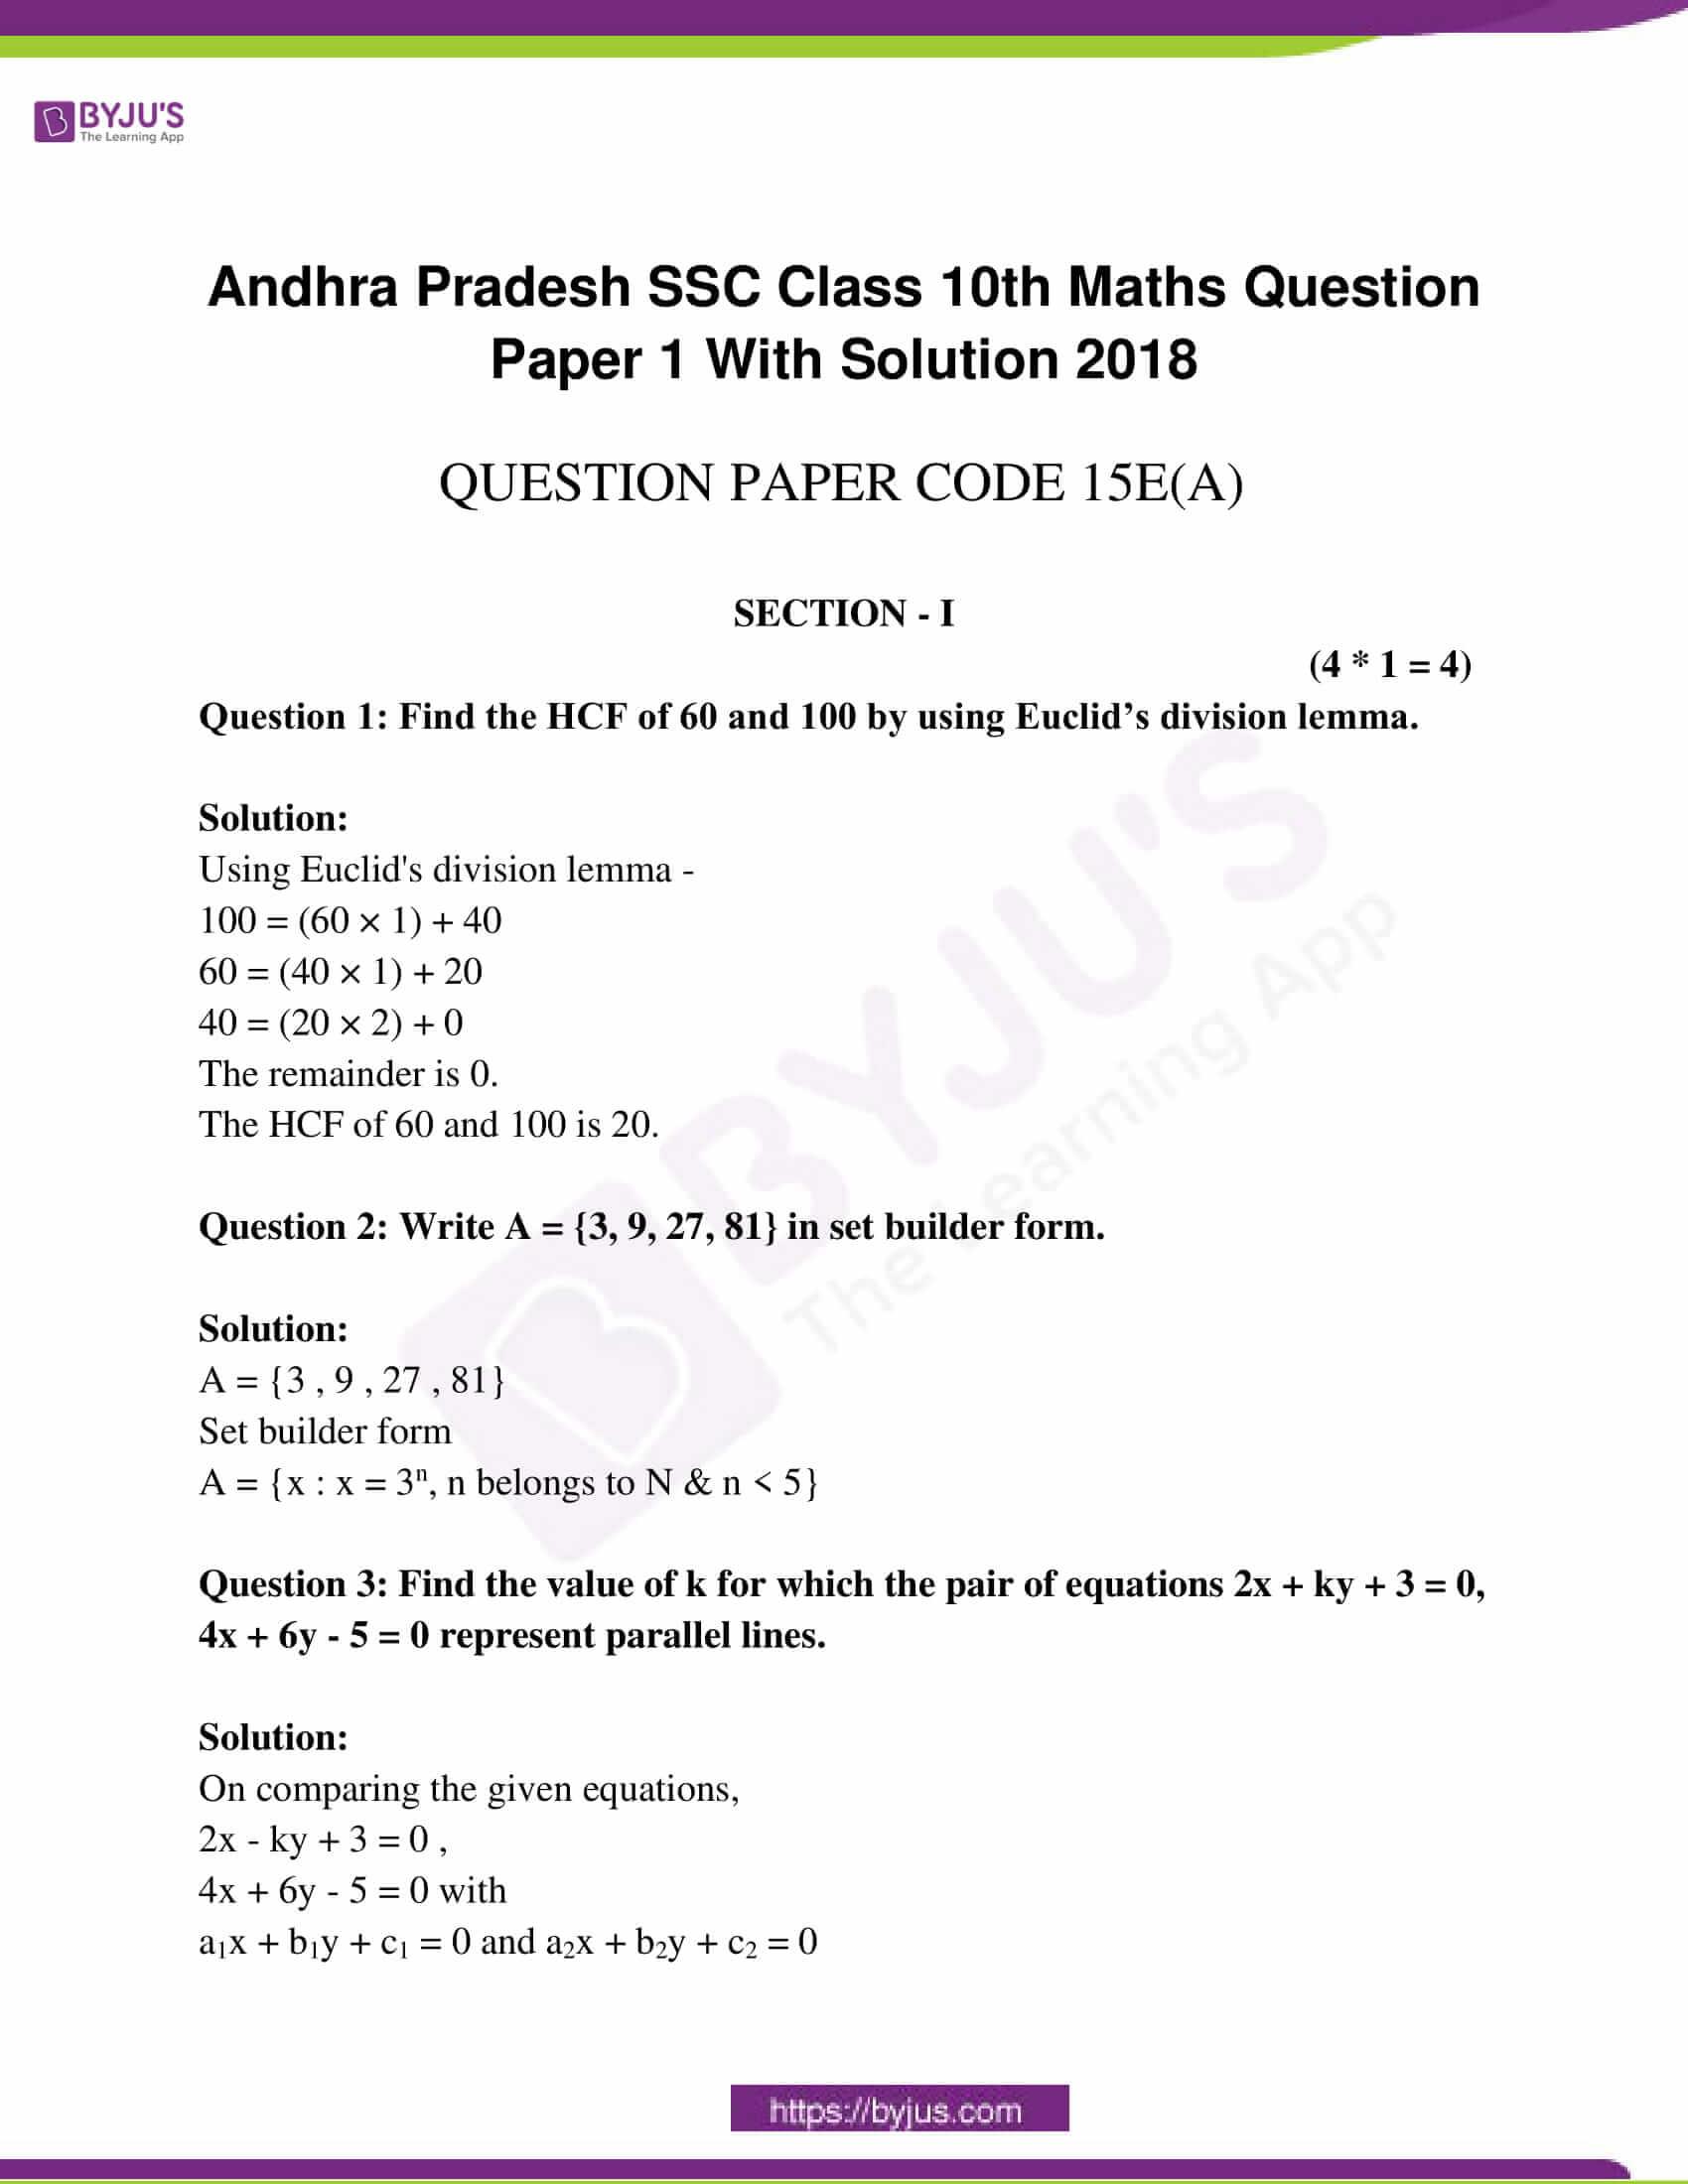 ap class 10 maths question paper 1 sol march 2018 01